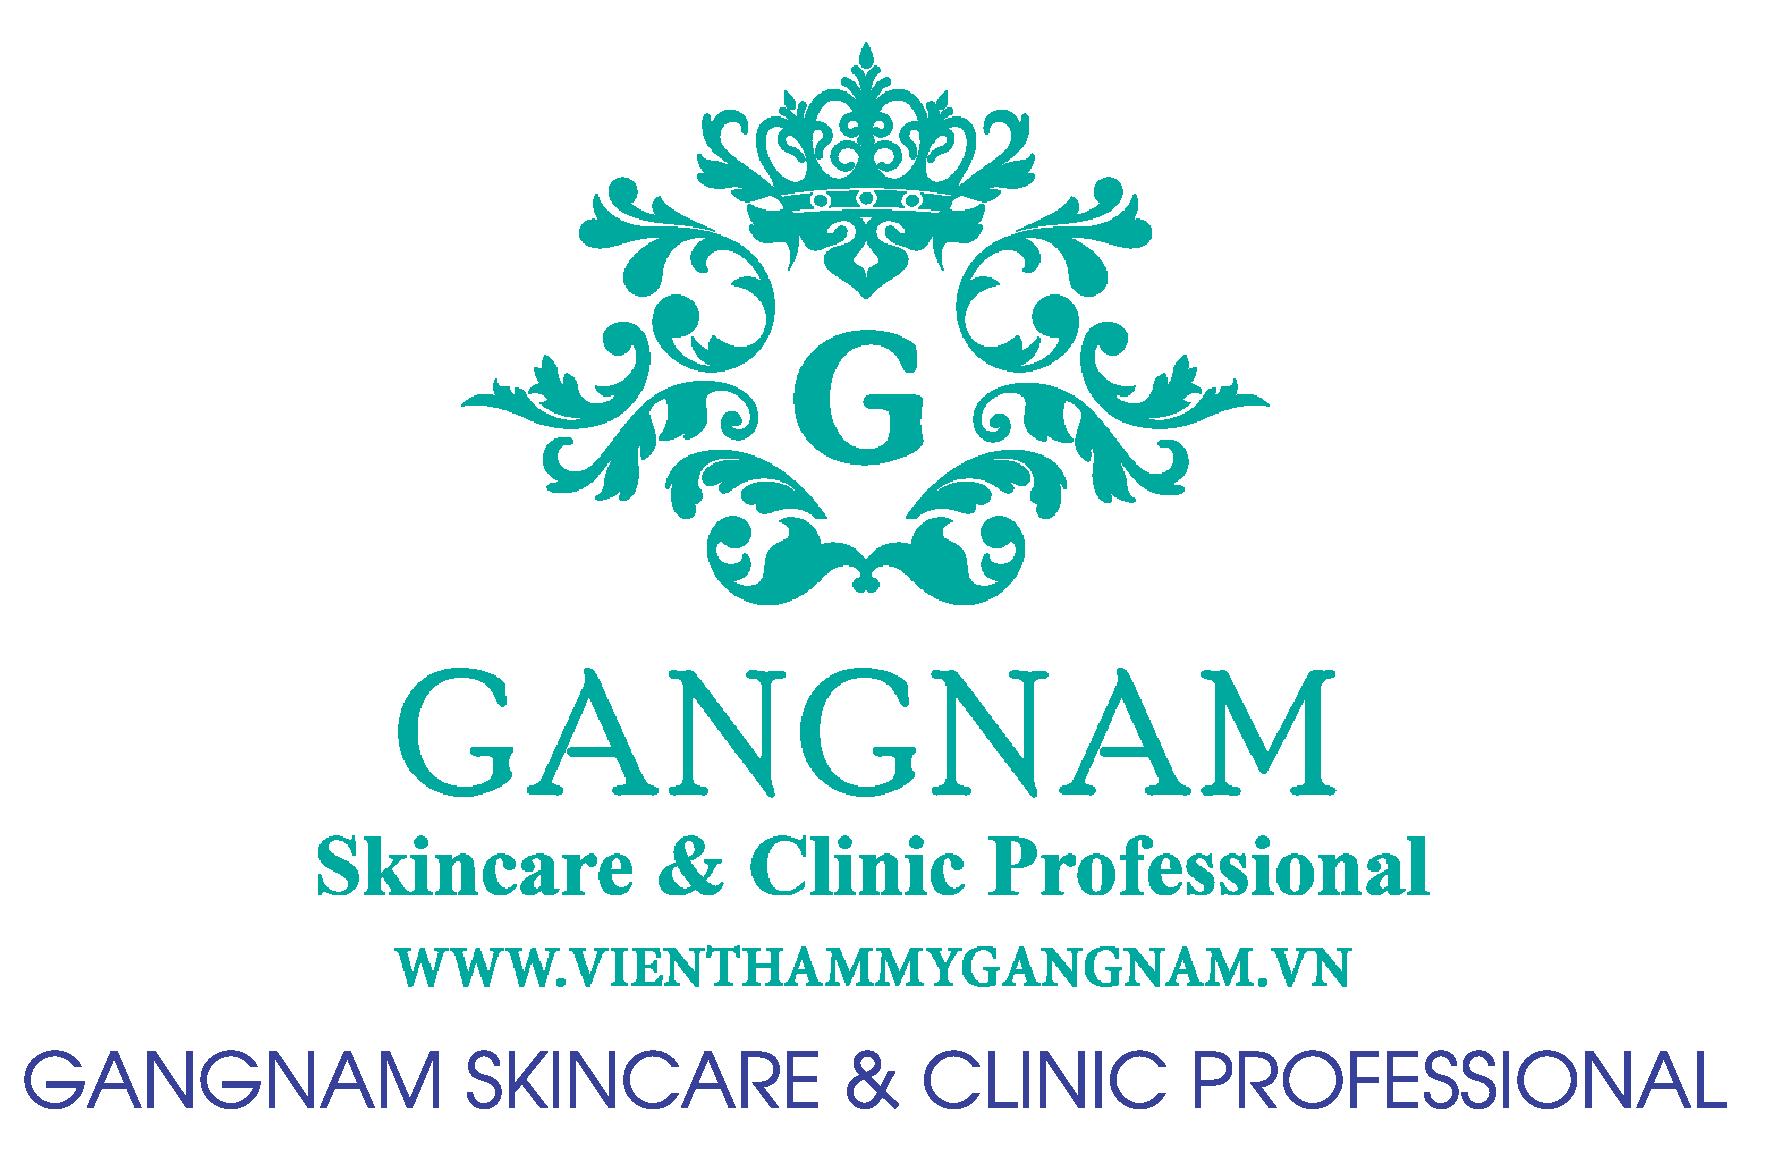 gangnam-skincare-1503-2503